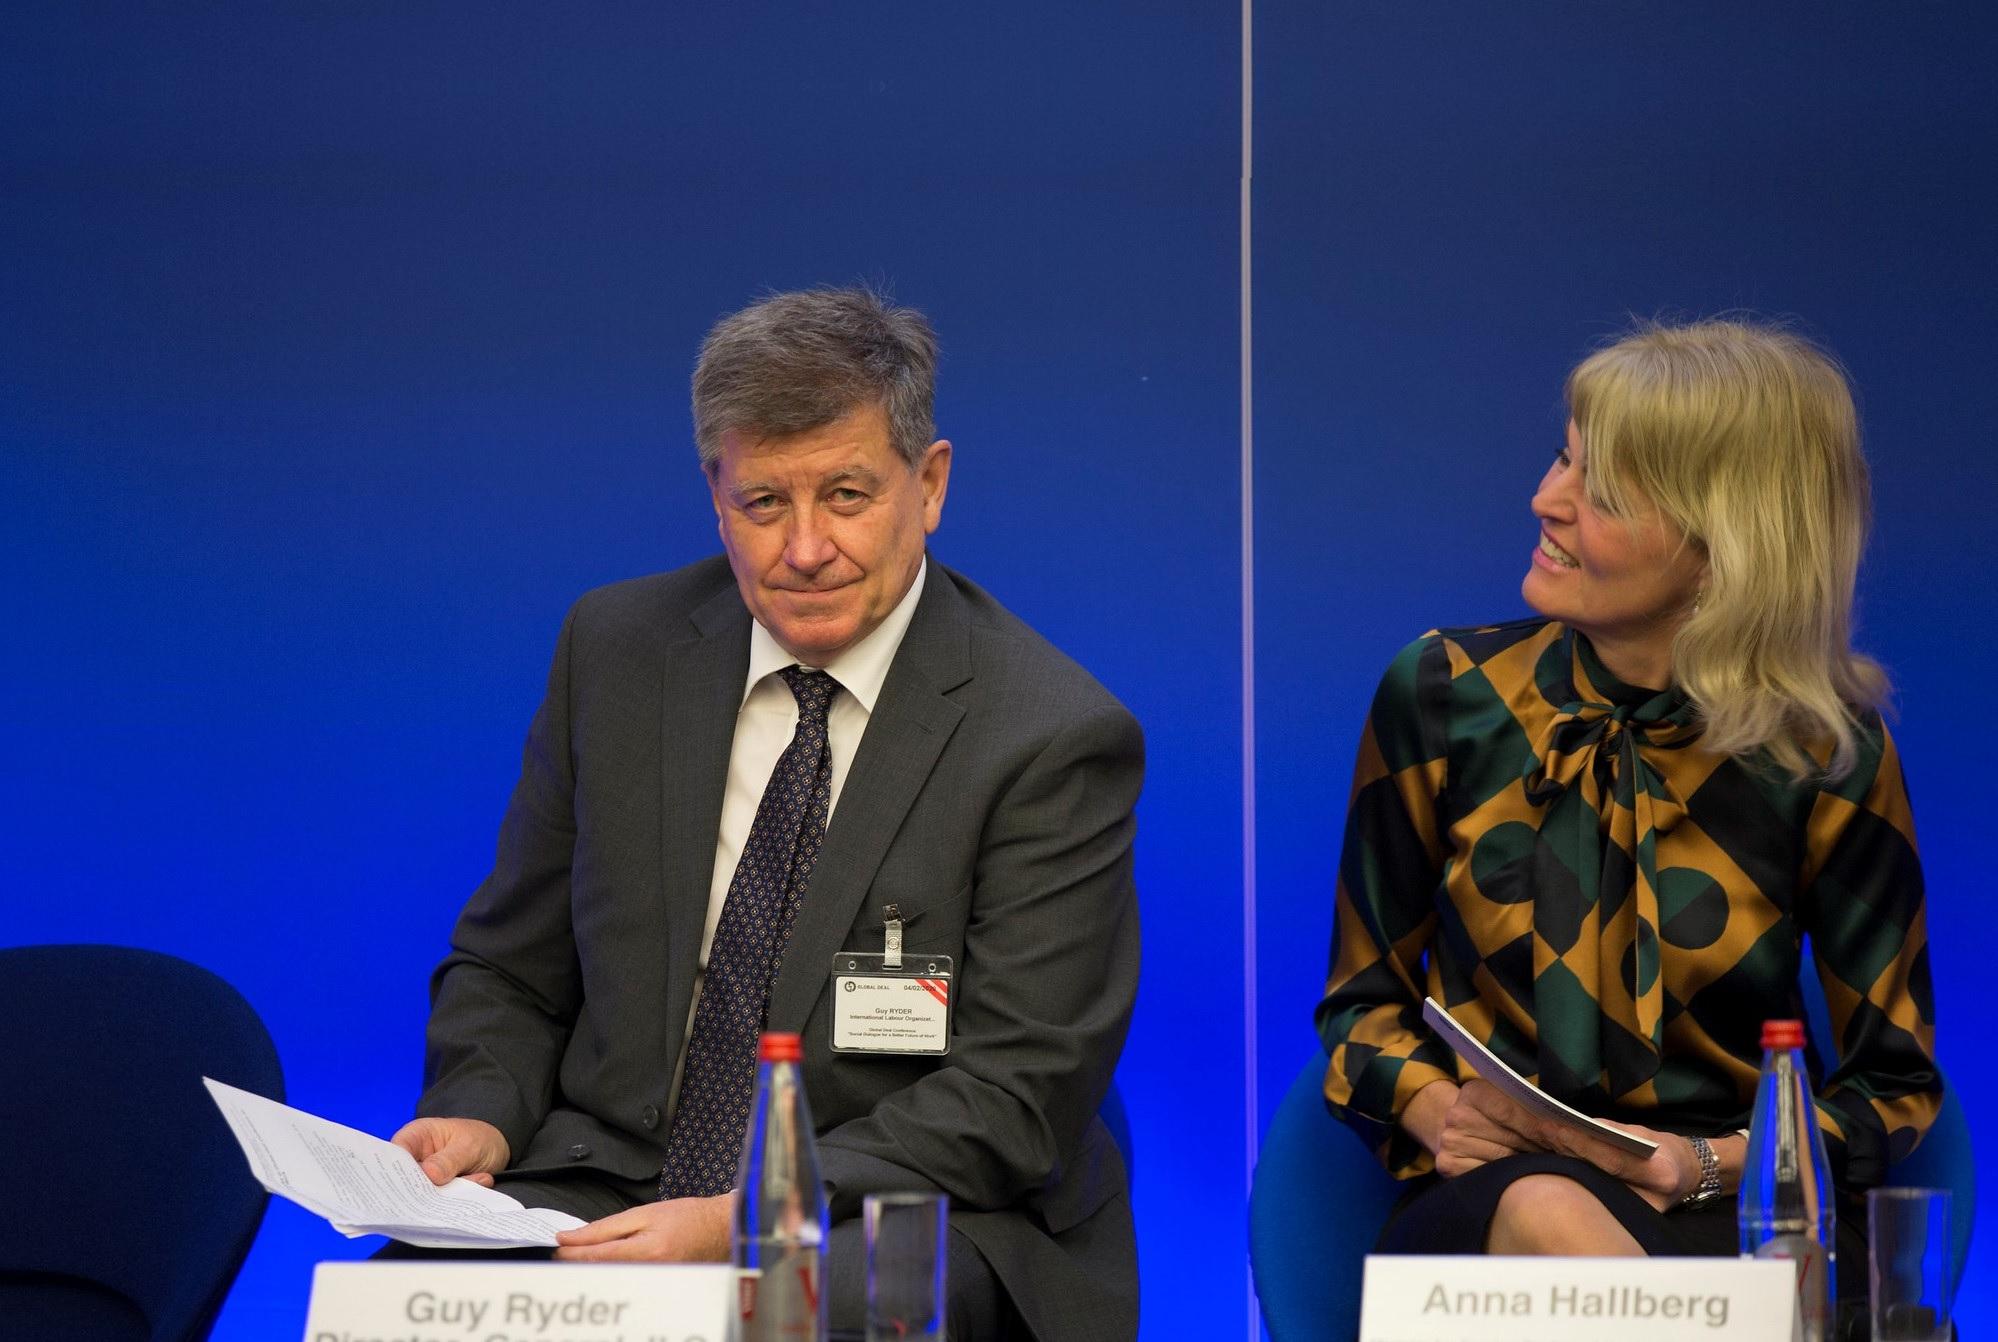 Global initiative to strengthen social dialogue